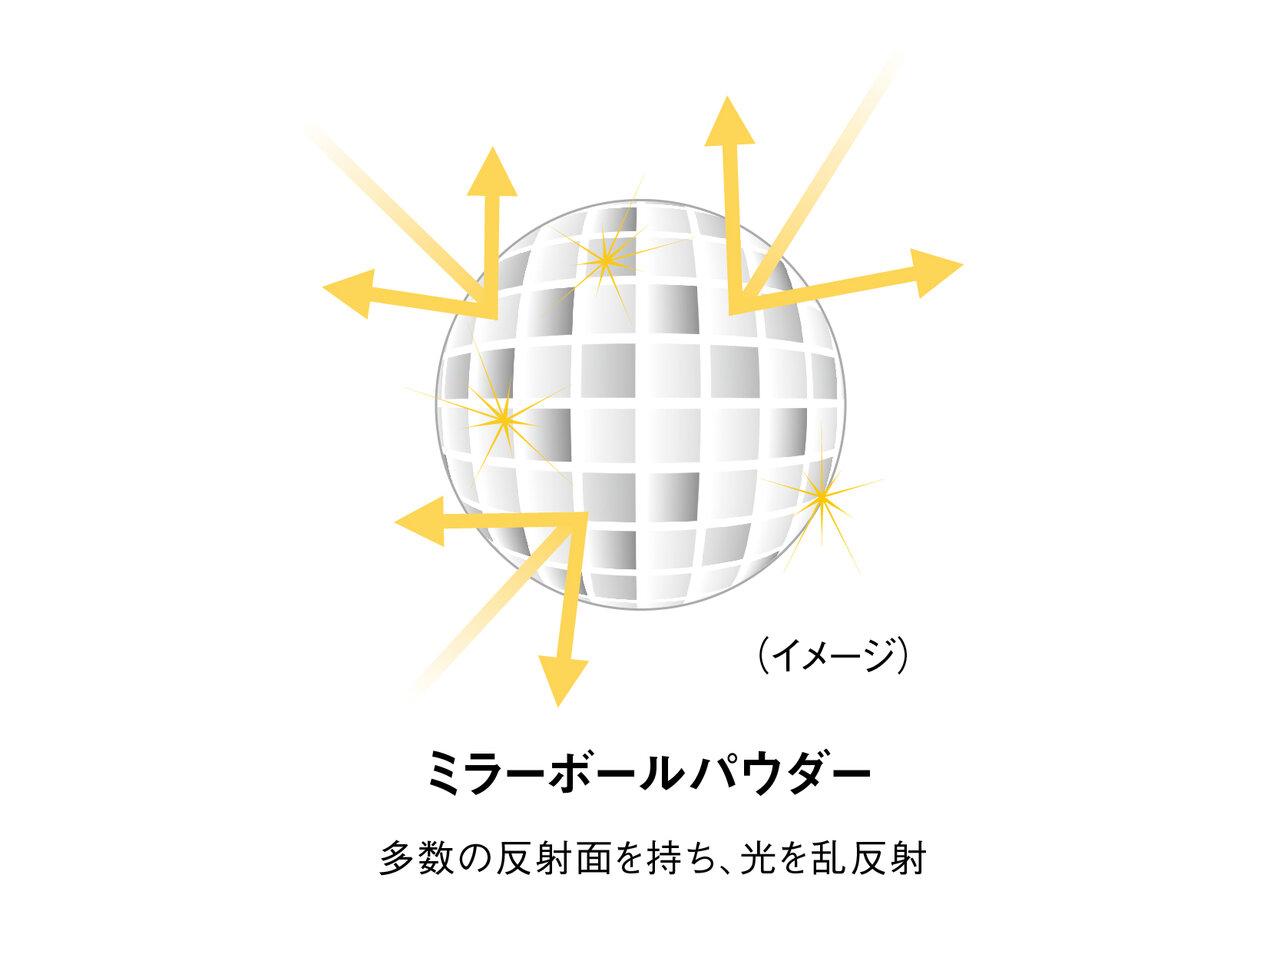 Koh Gen Do/コウゲンドウ「マイファンスィー ミネラル アイシャドー パレット03」